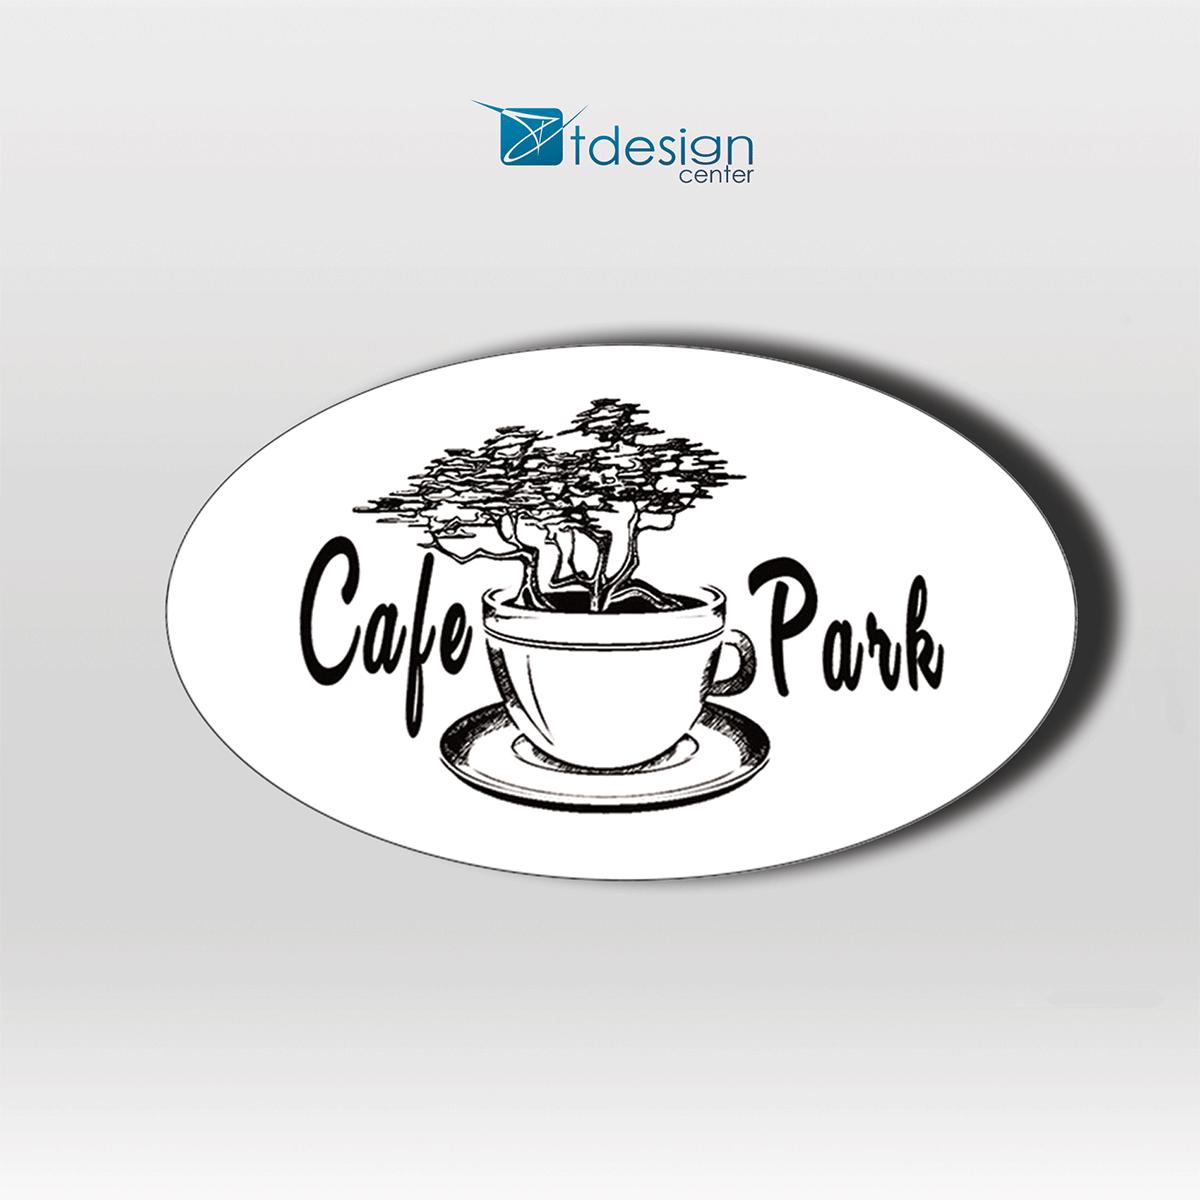 Naklejki 80x40m, projekt + druk, realizacja dla CafePark